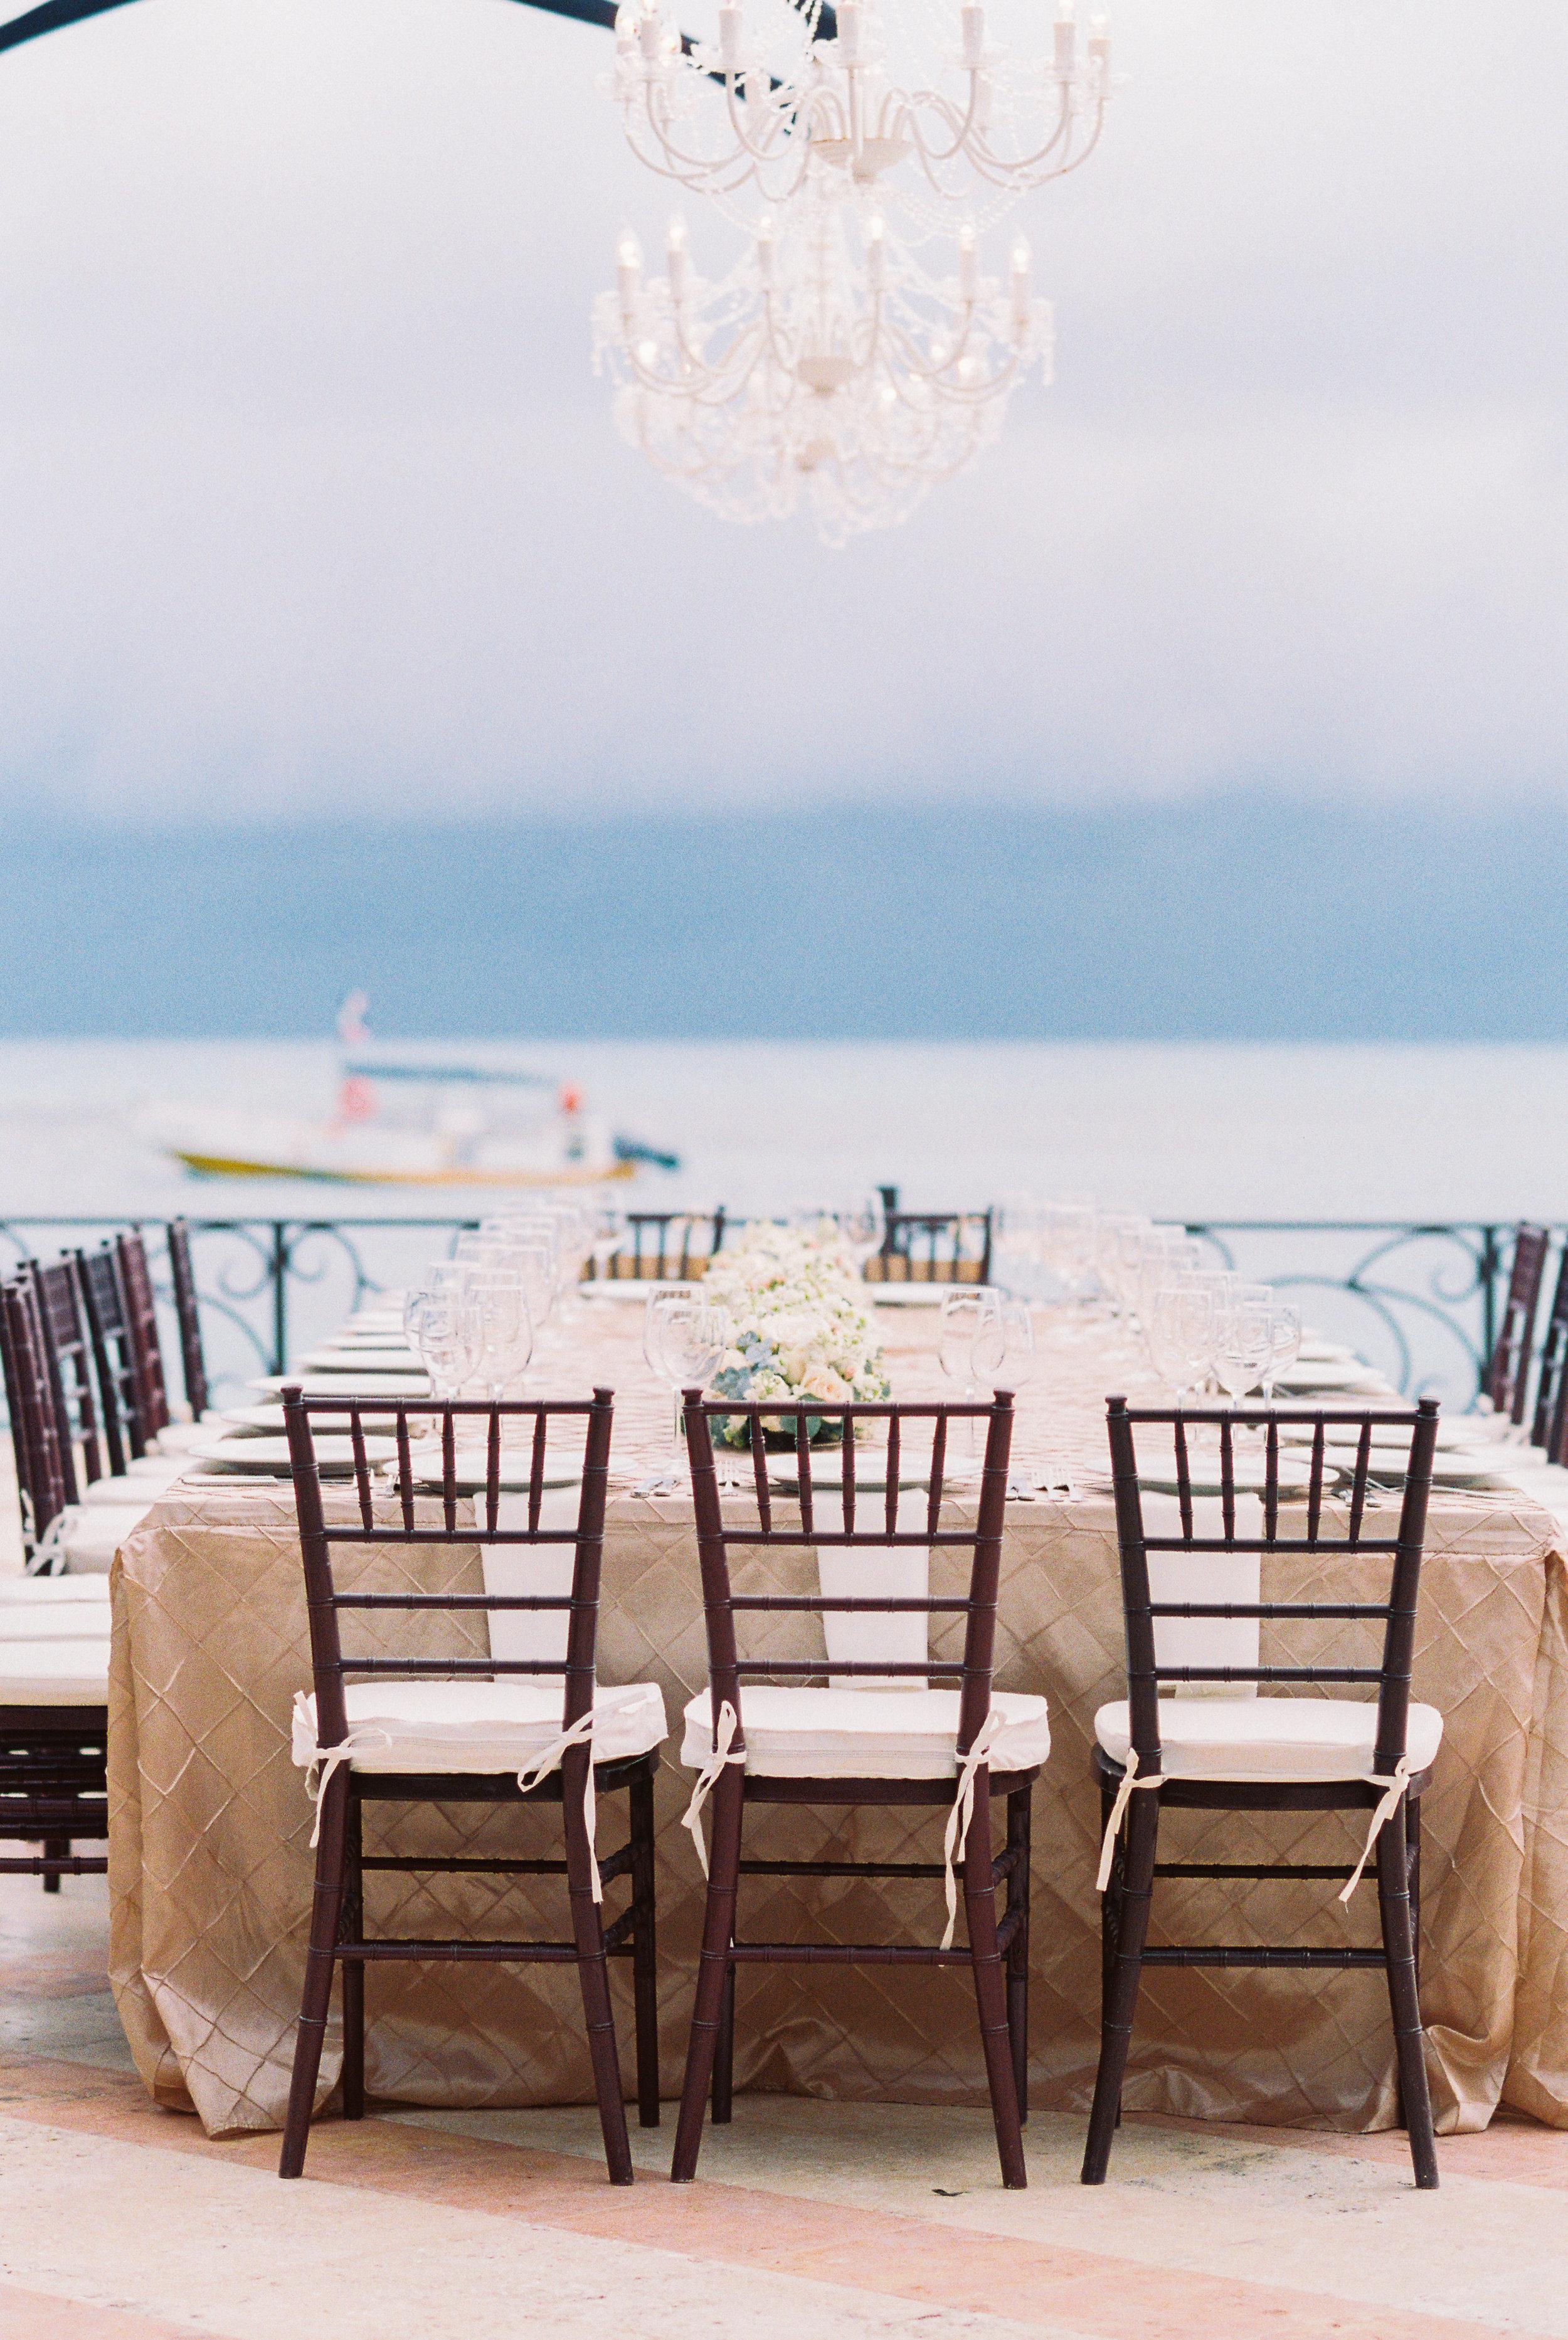 mexico_destination_wedding_villa_la_joya_cancun_52.jpg